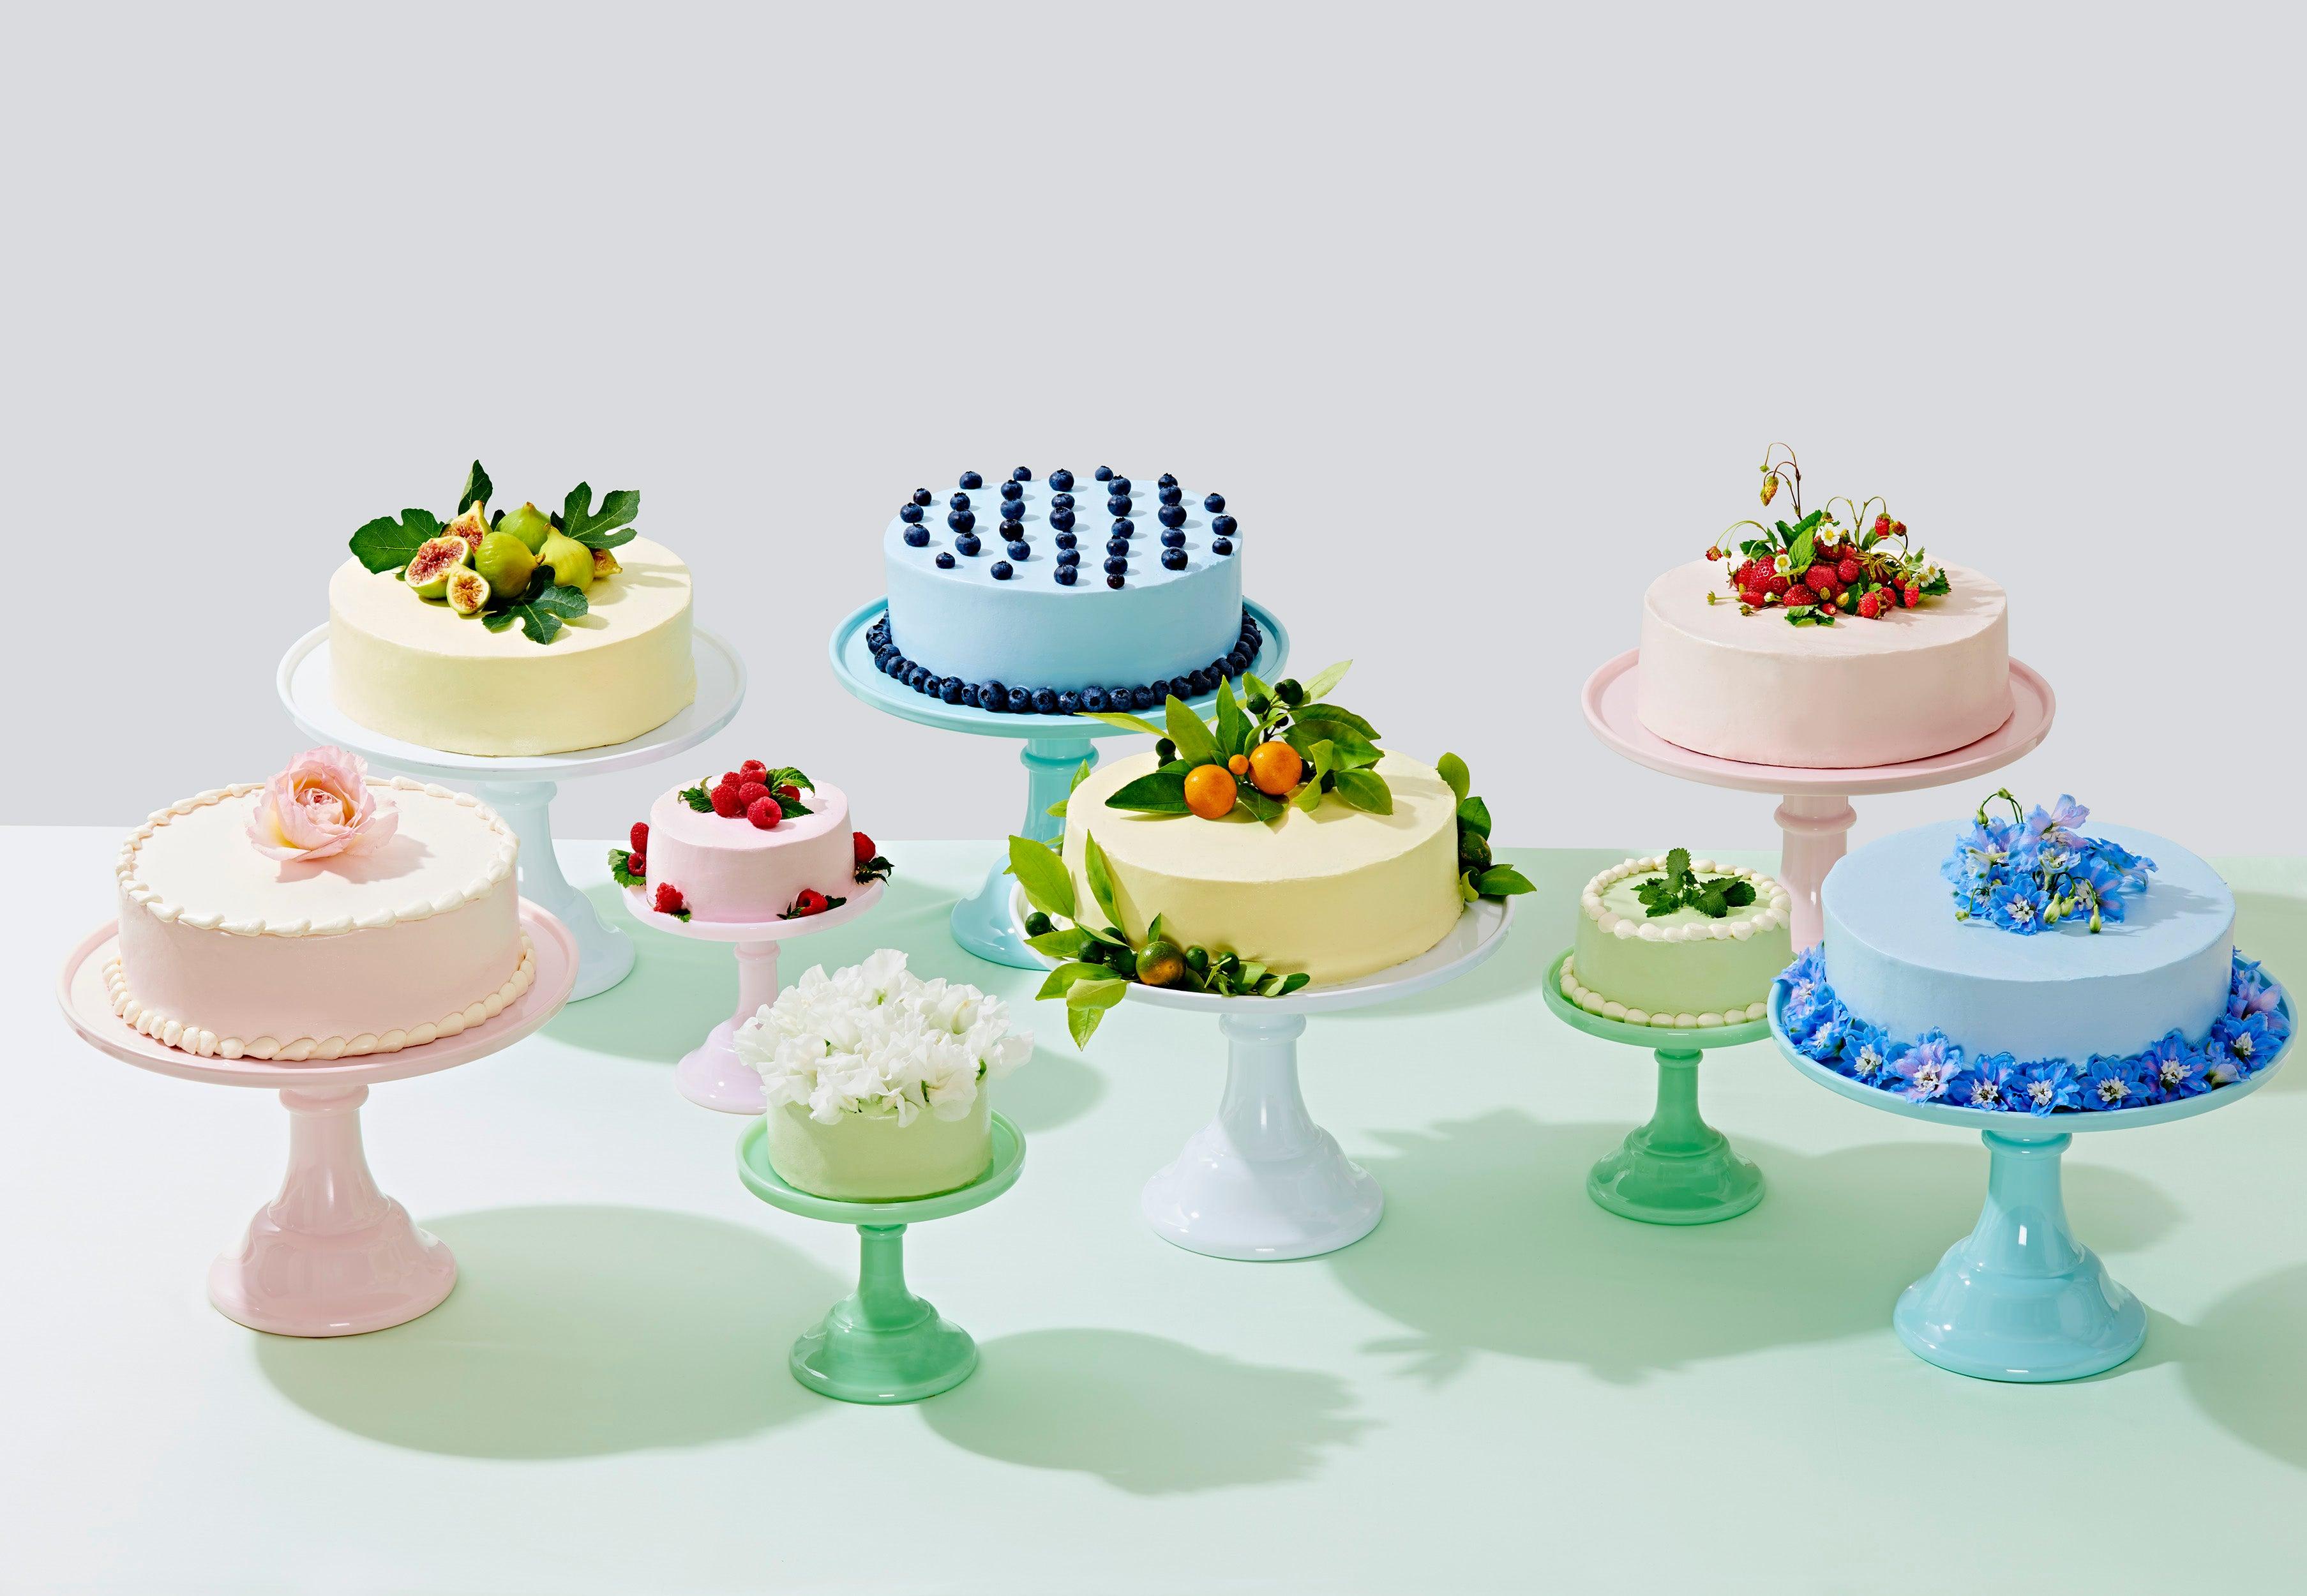 190807-Cake-Display-377 (1)